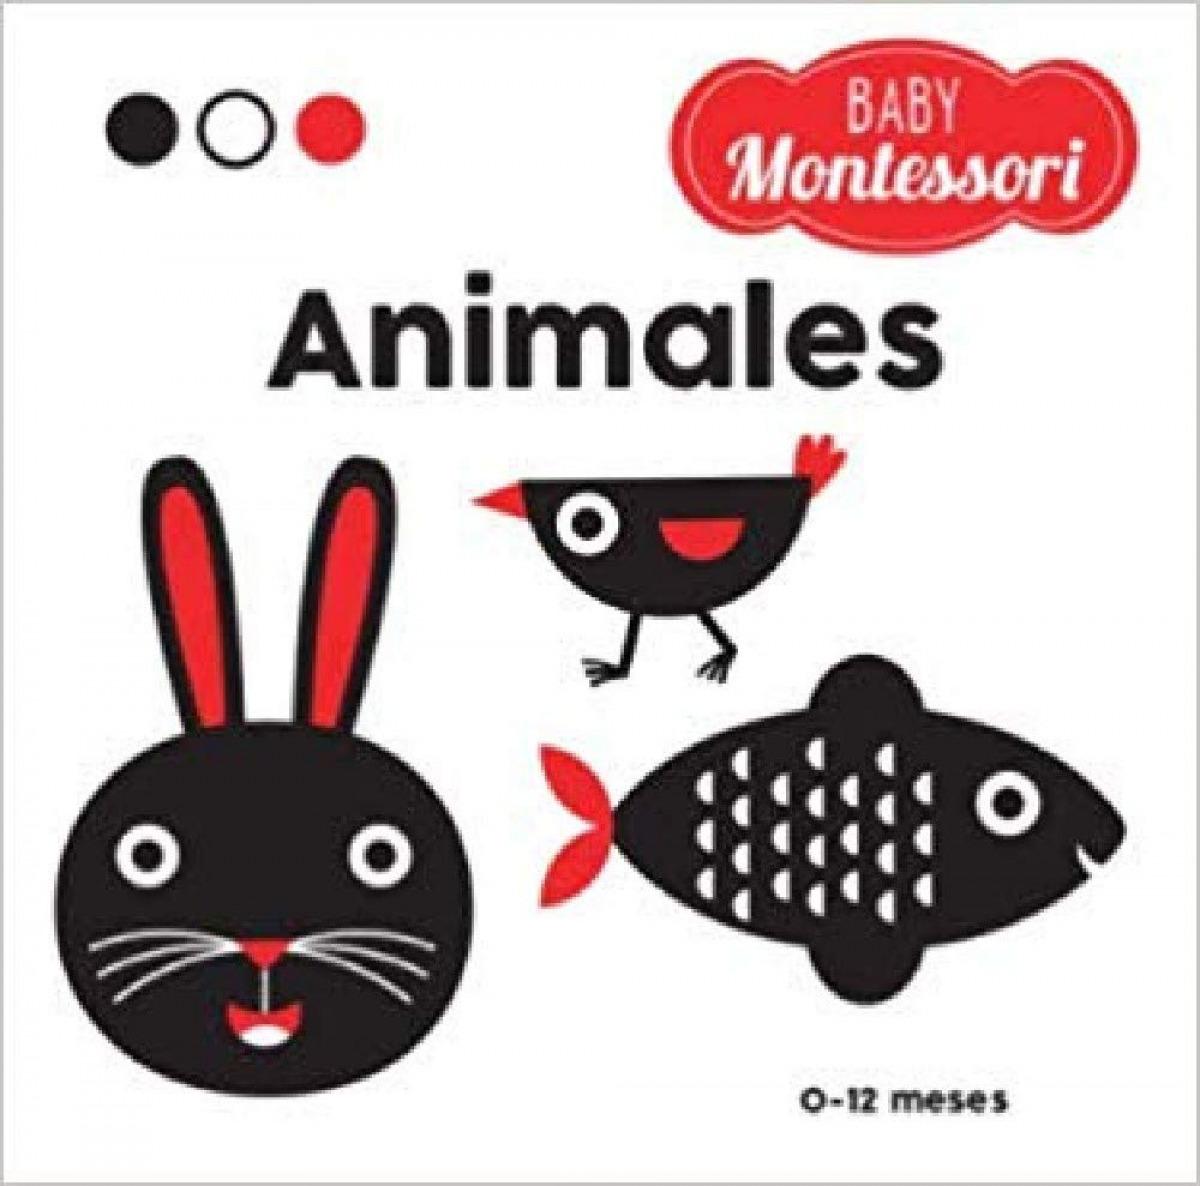 ANIMALES. BABY MONTESSORI